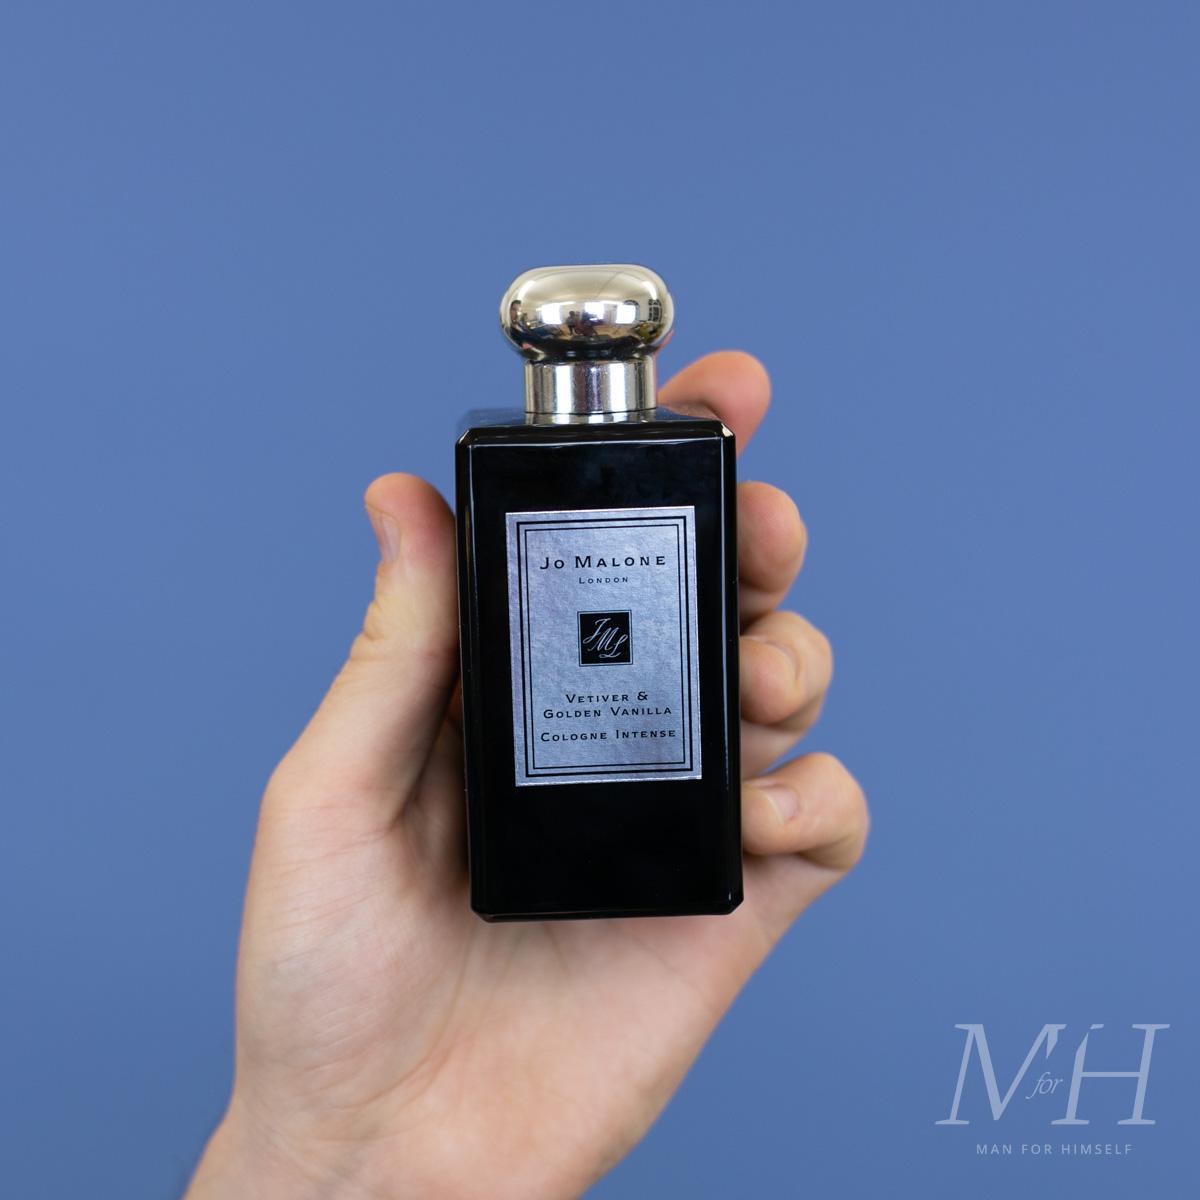 jo-malone-vetiver-golden-vanilla-fragrance-product-review-man-for-himself